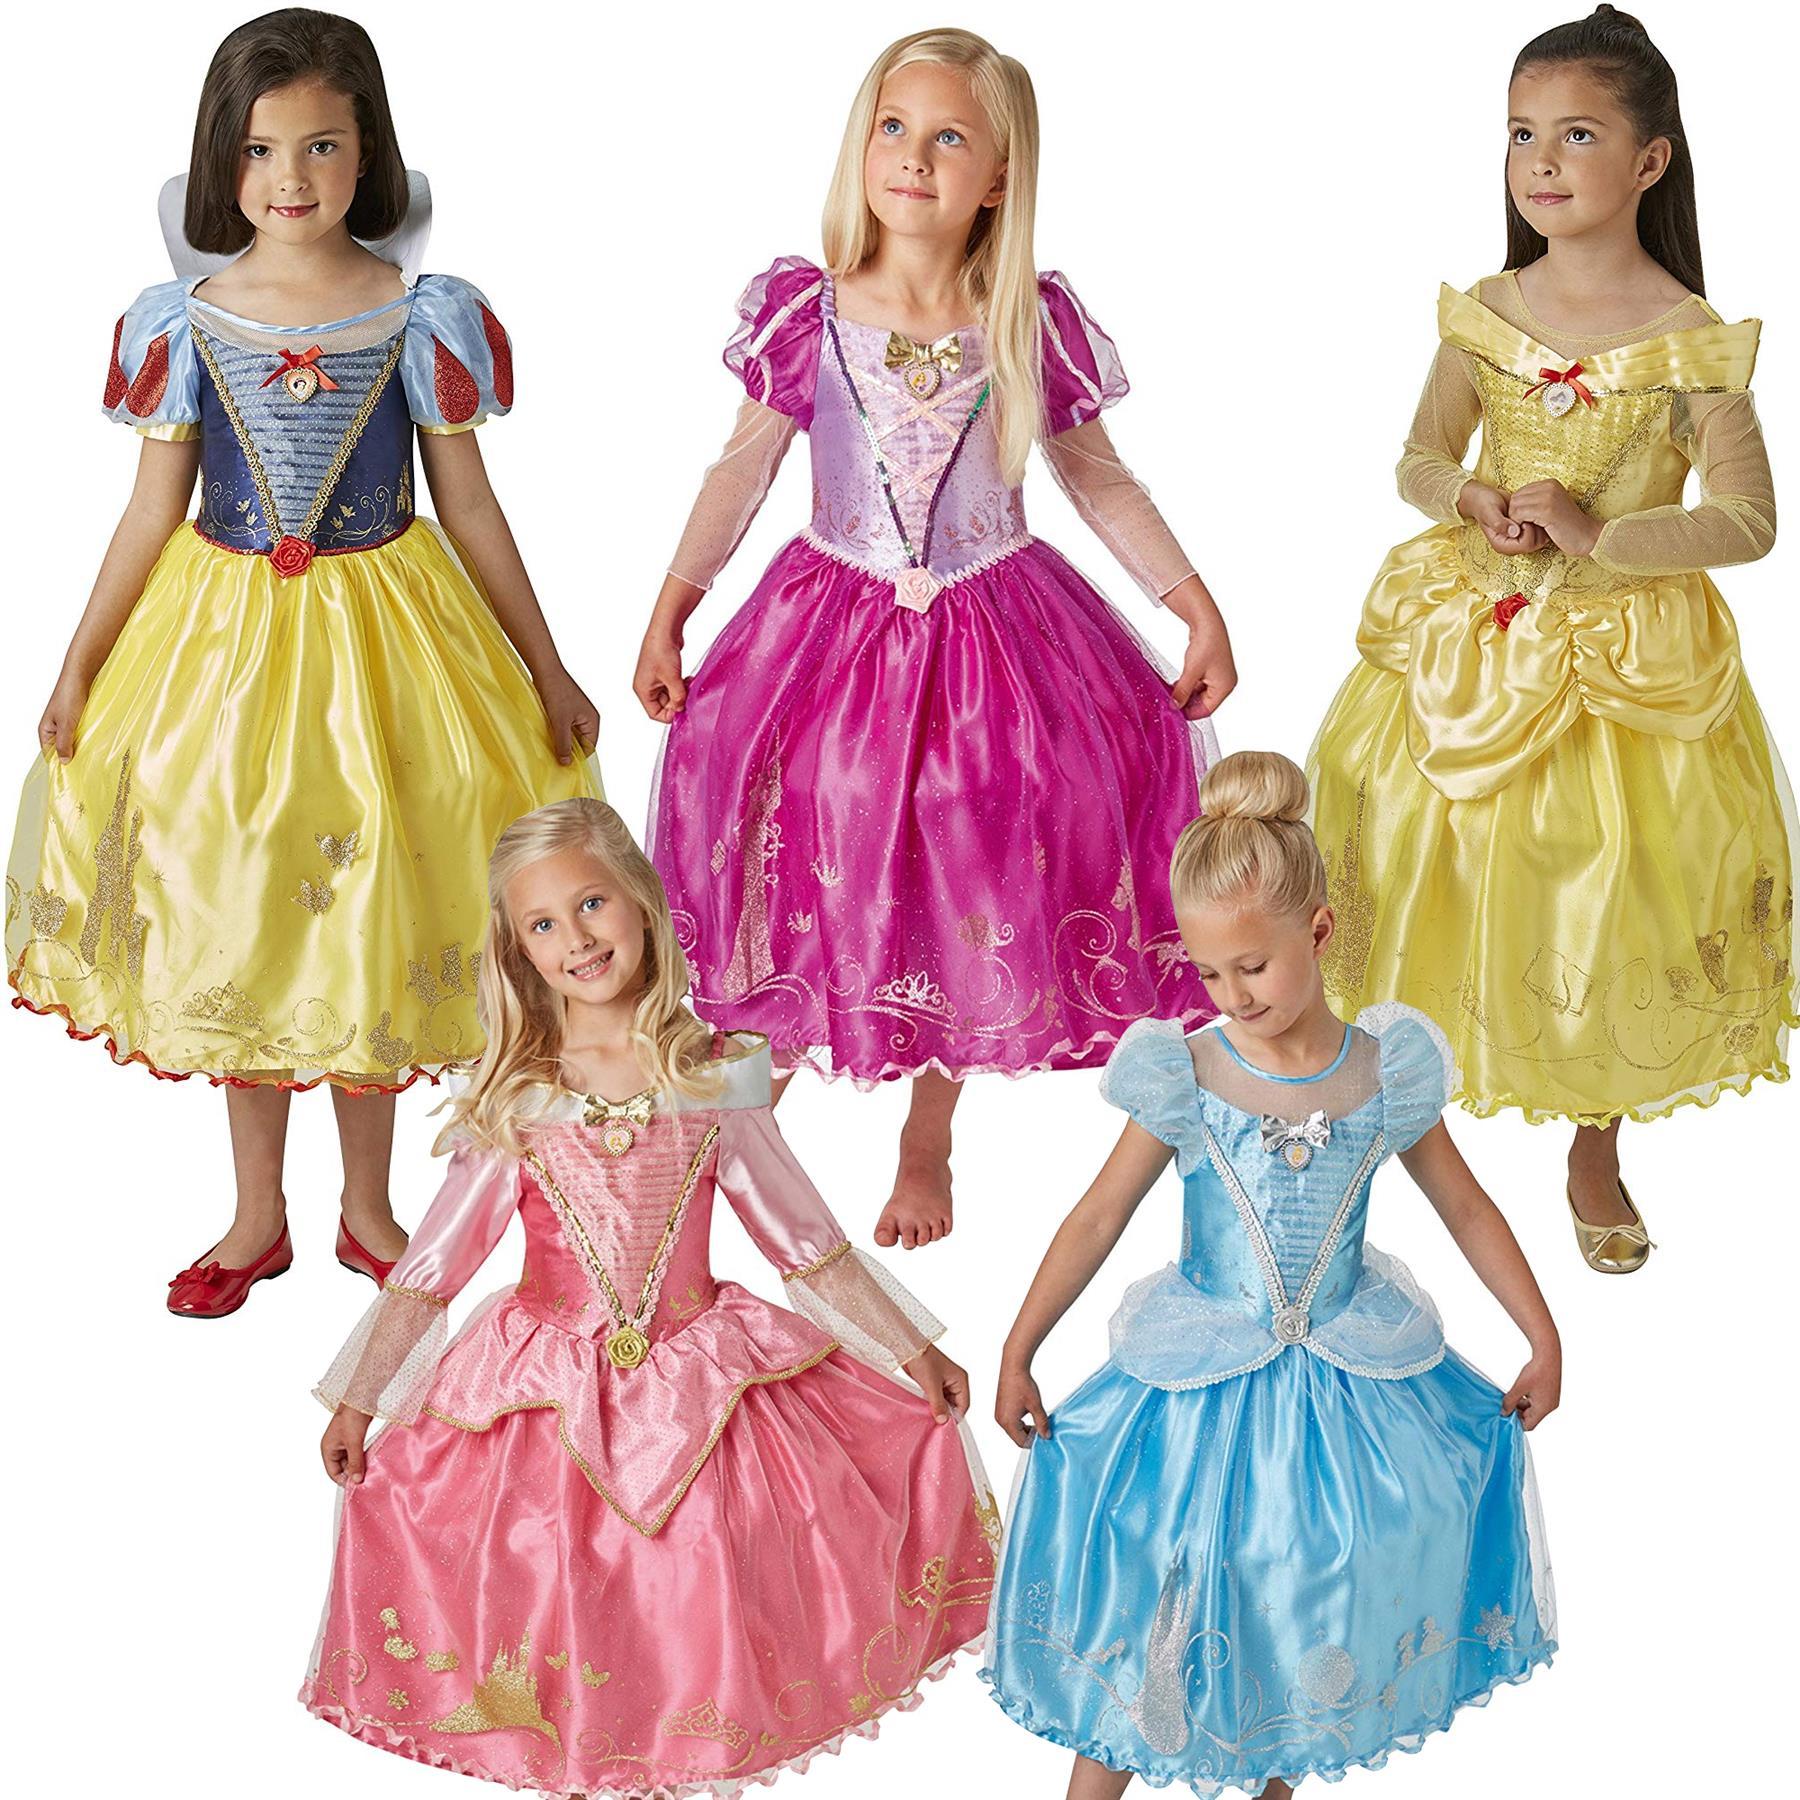 Official Disney Princess Ballgown Costumes Girls Child Fancy Dress Ebay